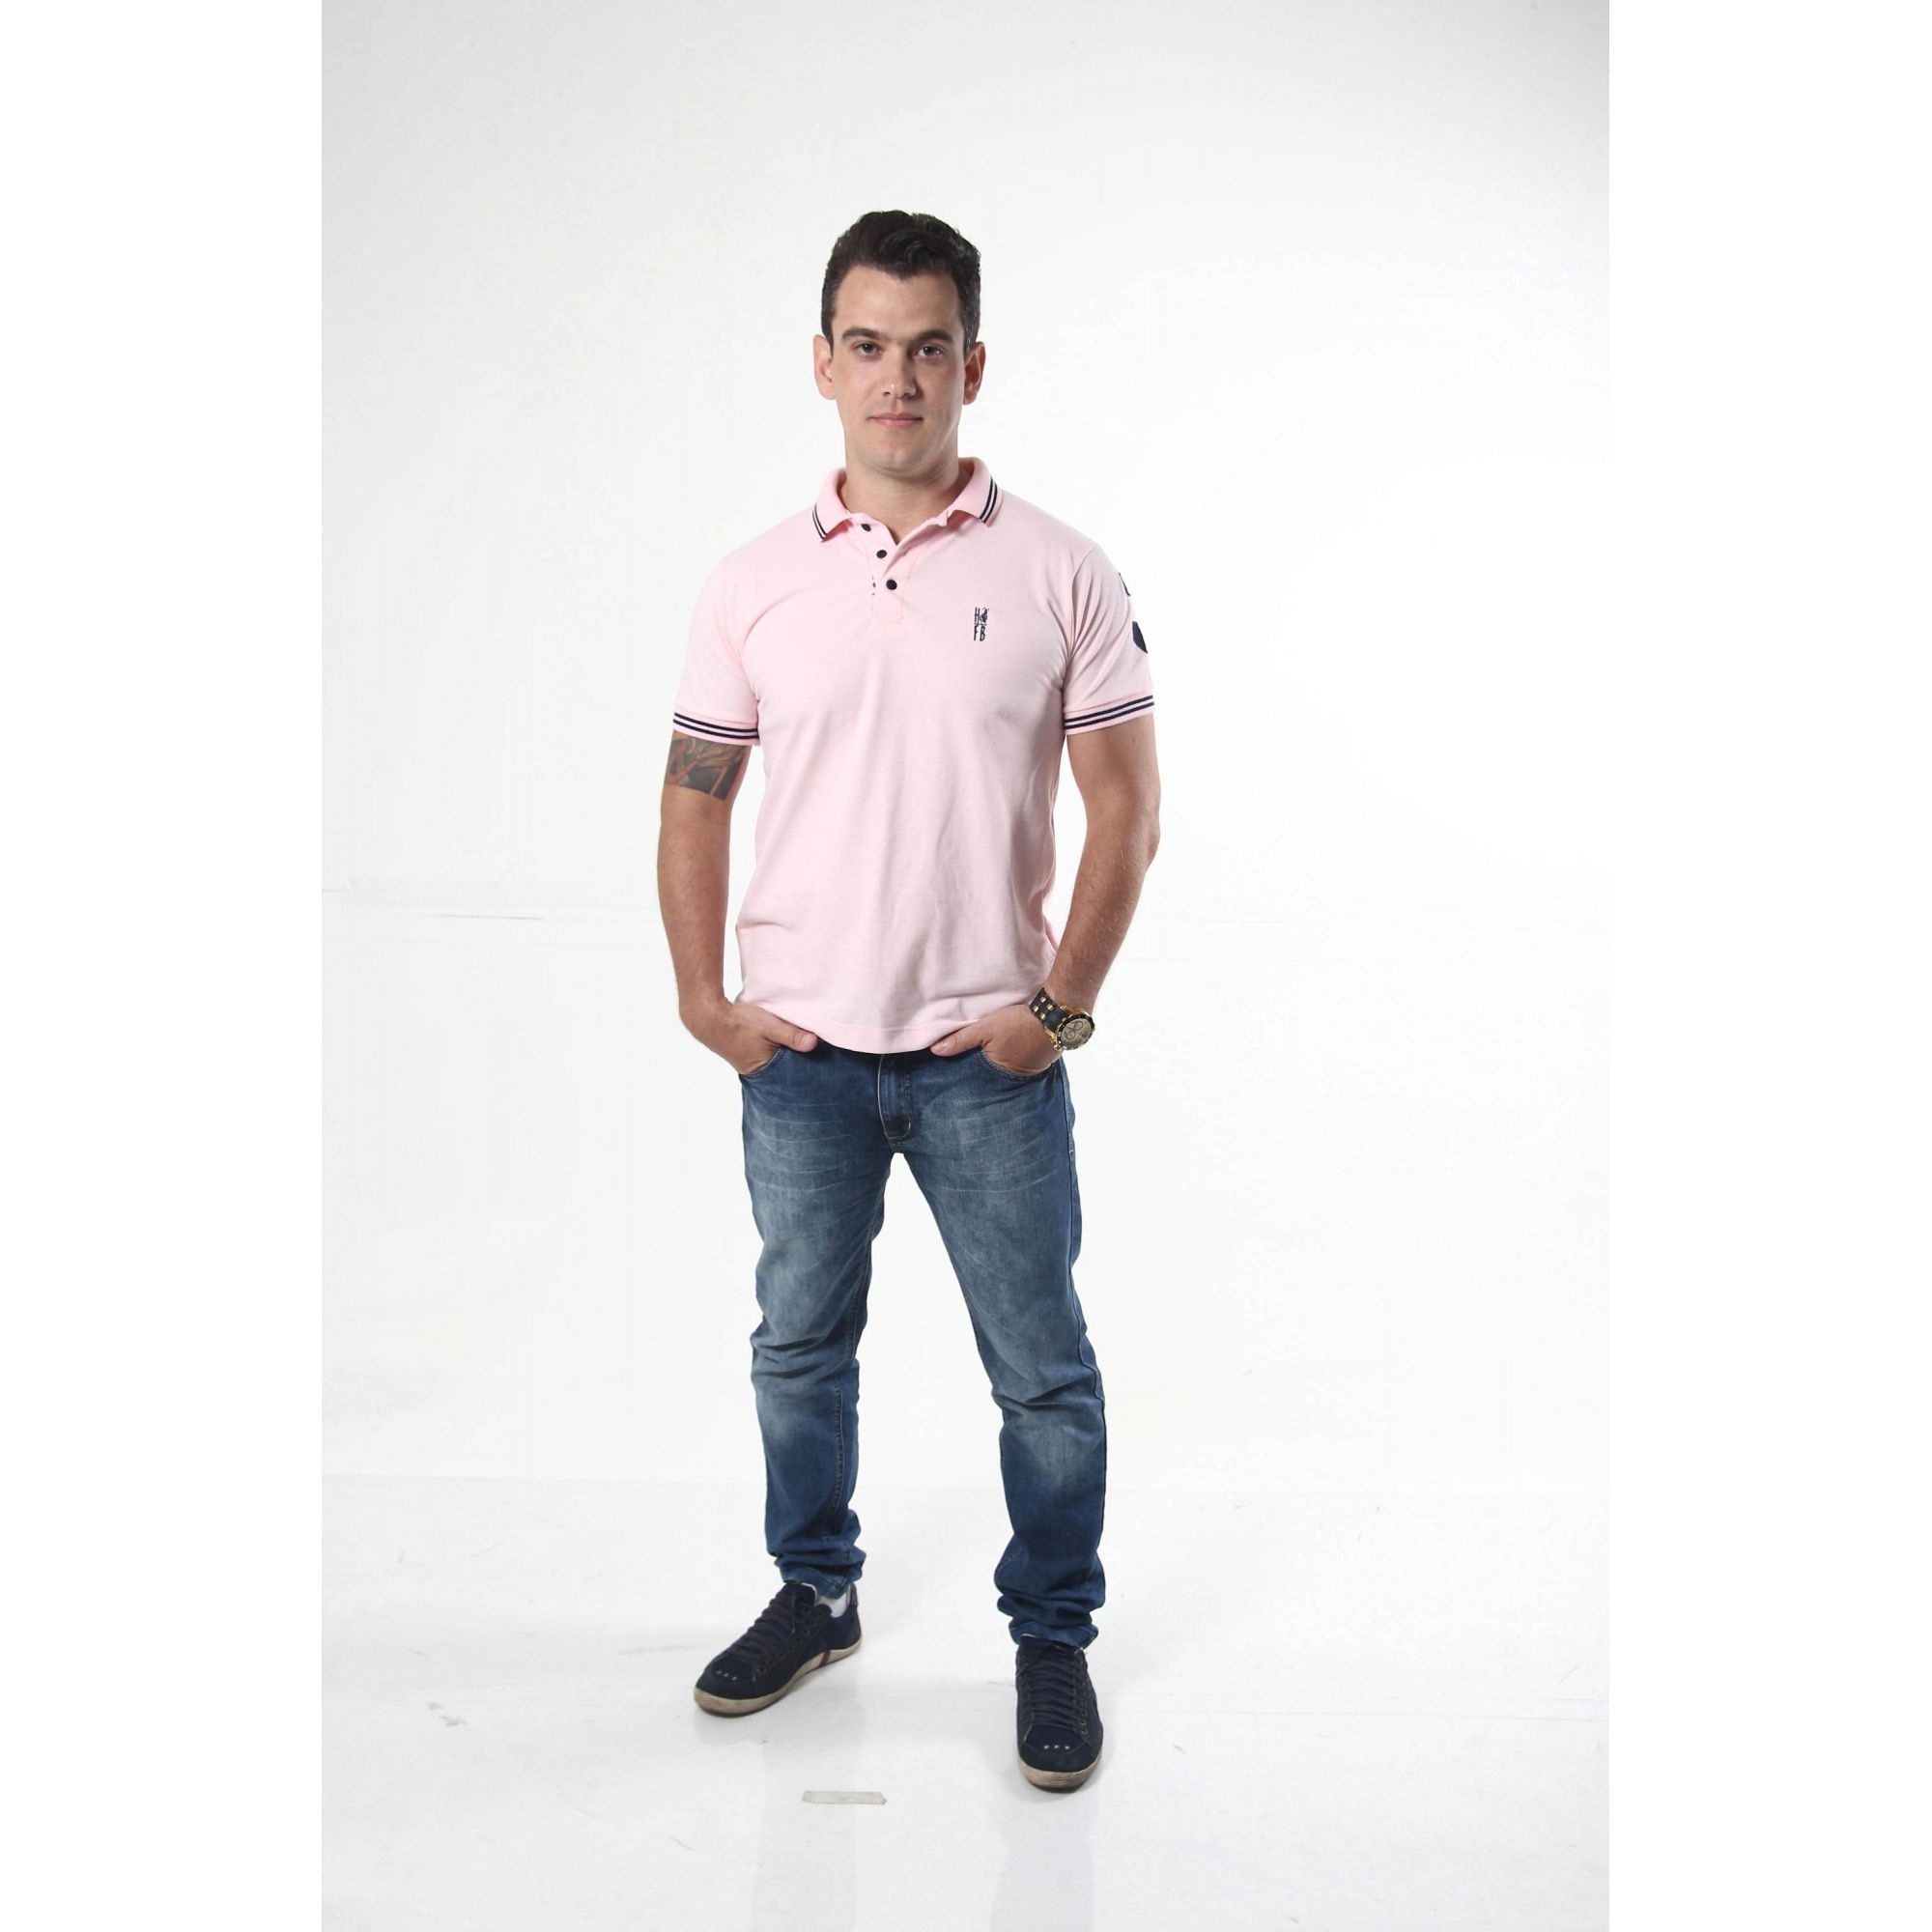 PAI E FILHO > Kit 02 Camisas ou Body Polo Rosa Amor  [Coleção Tal Pai Tal Filho]  - Heitor Fashion Brazil